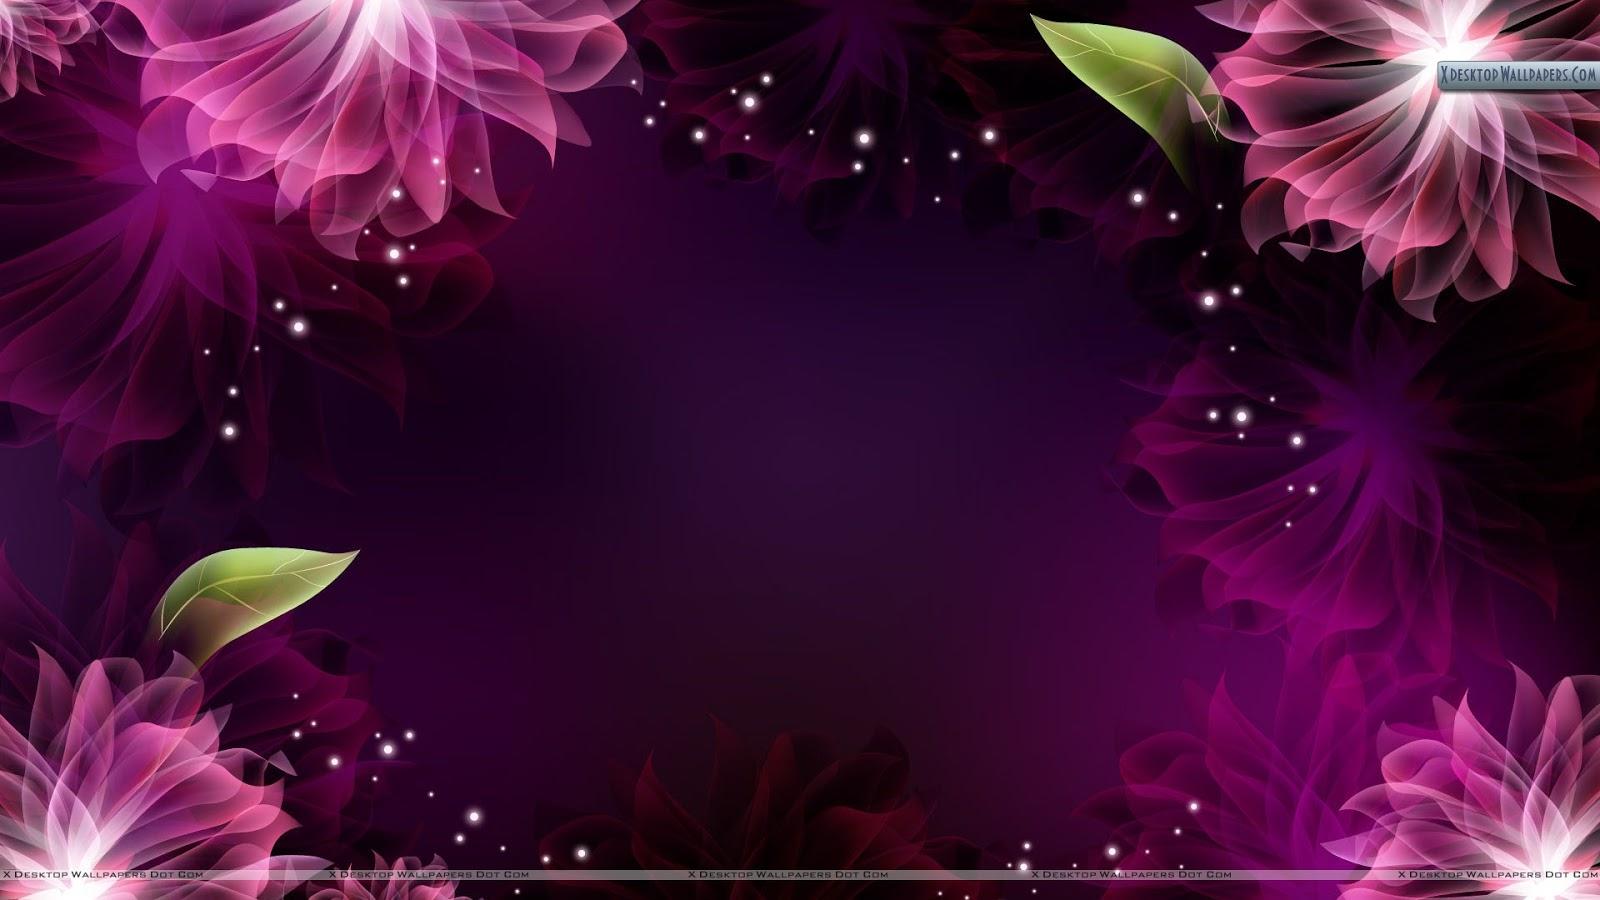 wallpaper Wallpaper Downloads Beautiful Flowers Background 1600x900